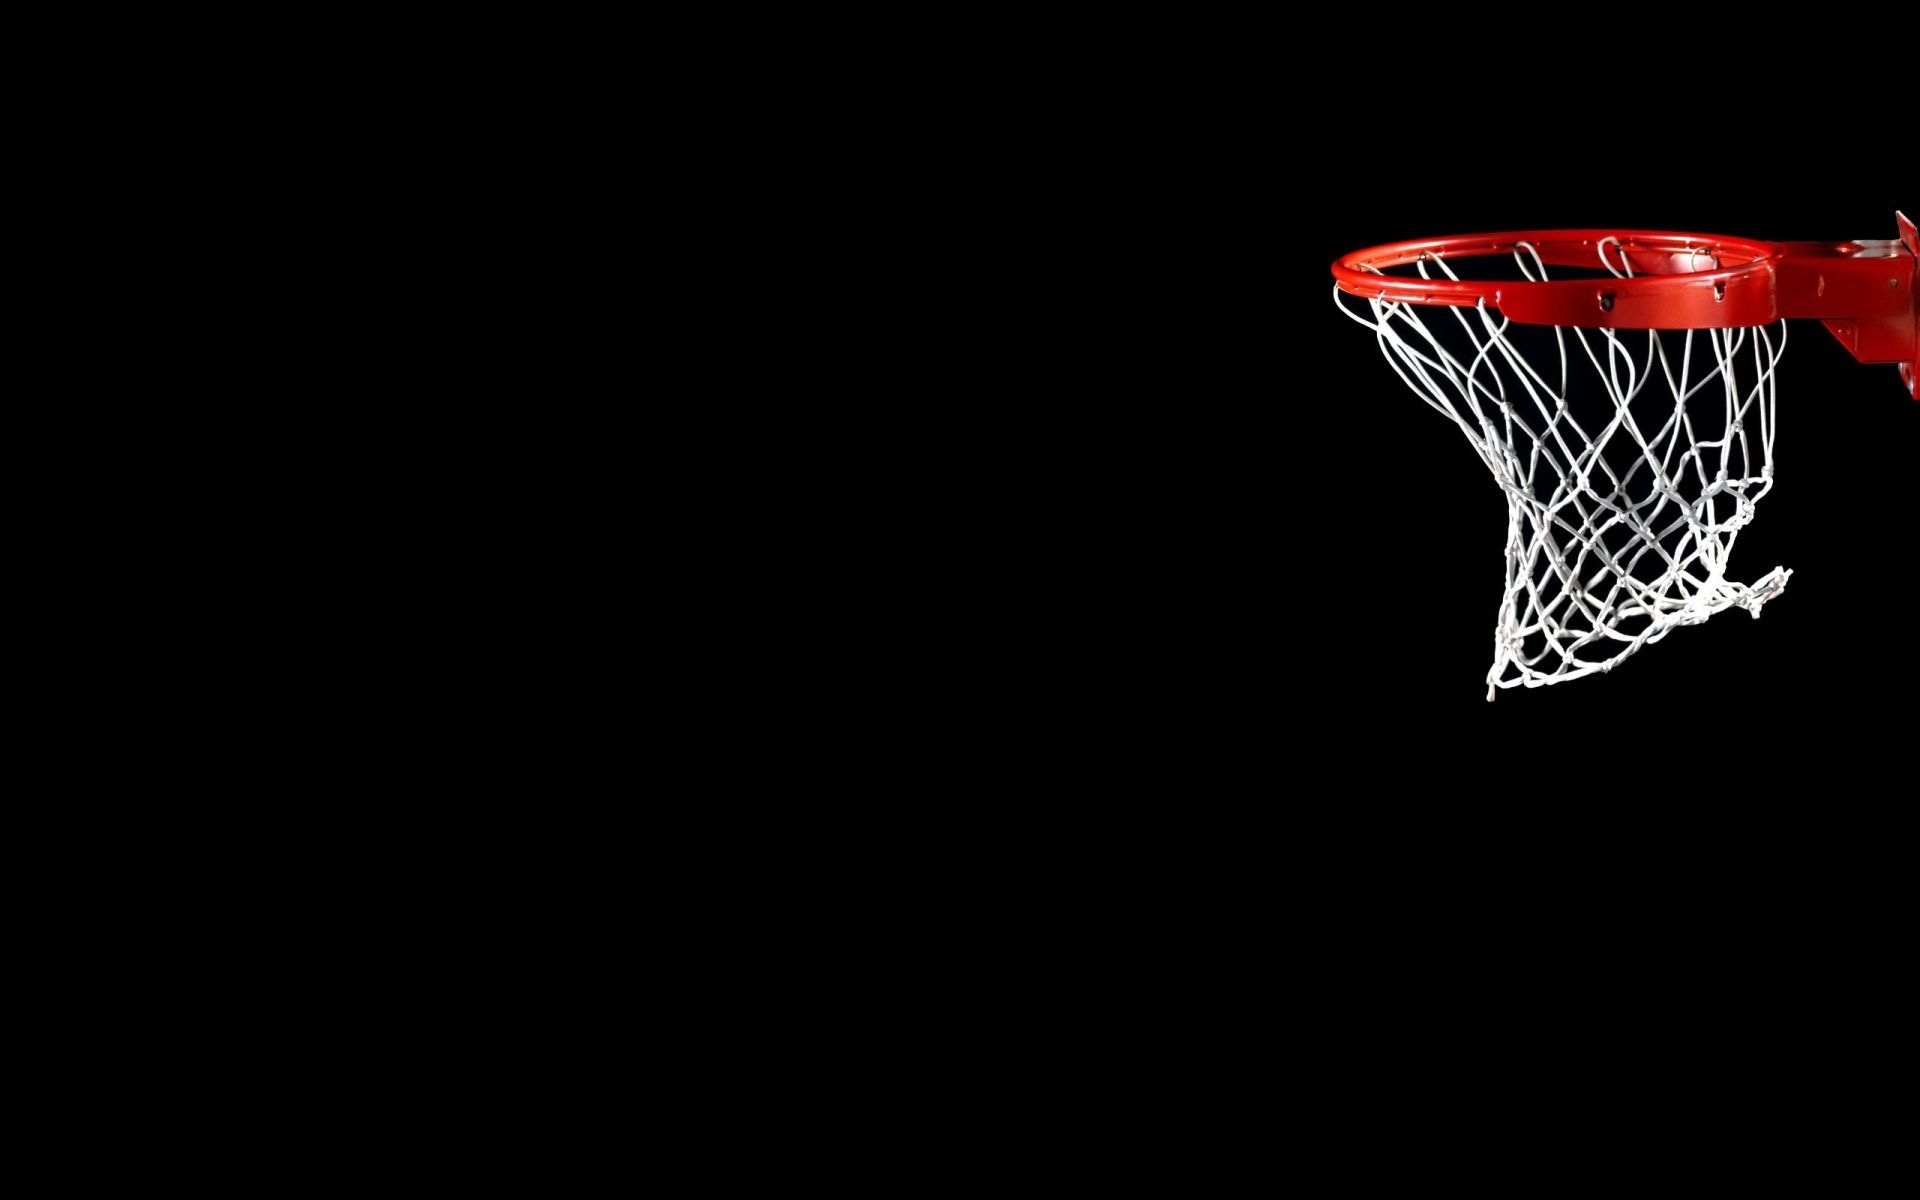 1920x1200 Basketball Hoop Black Hd Wallpaper Basketball Wallpaper Basketball Background Basketball Ring